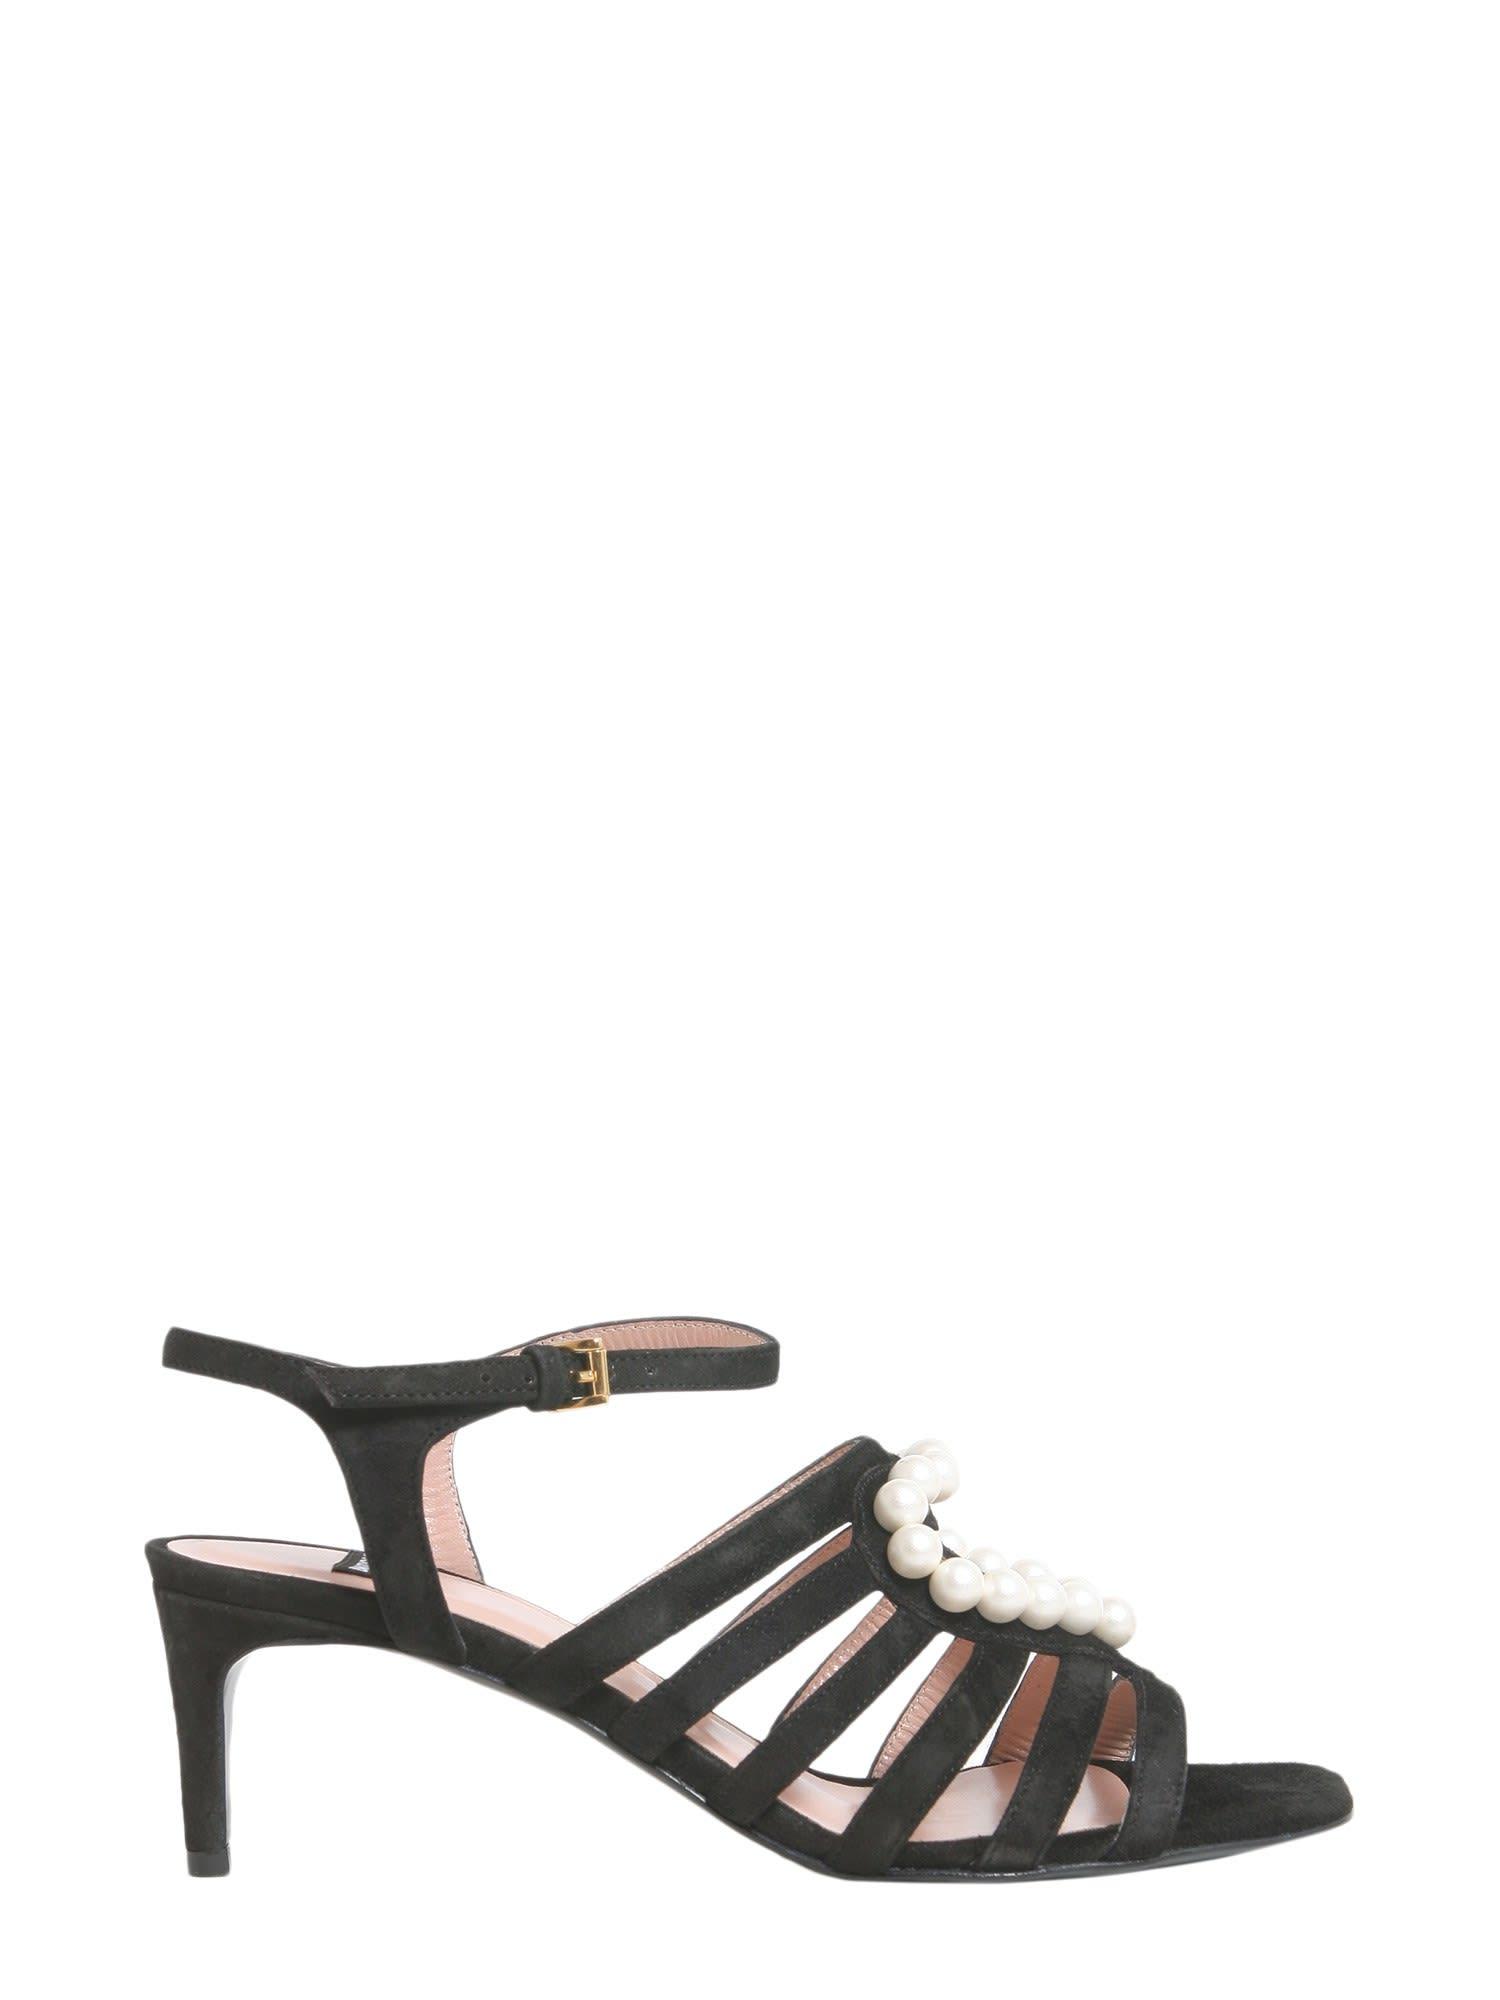 Boutique Moschino Suede Sandals